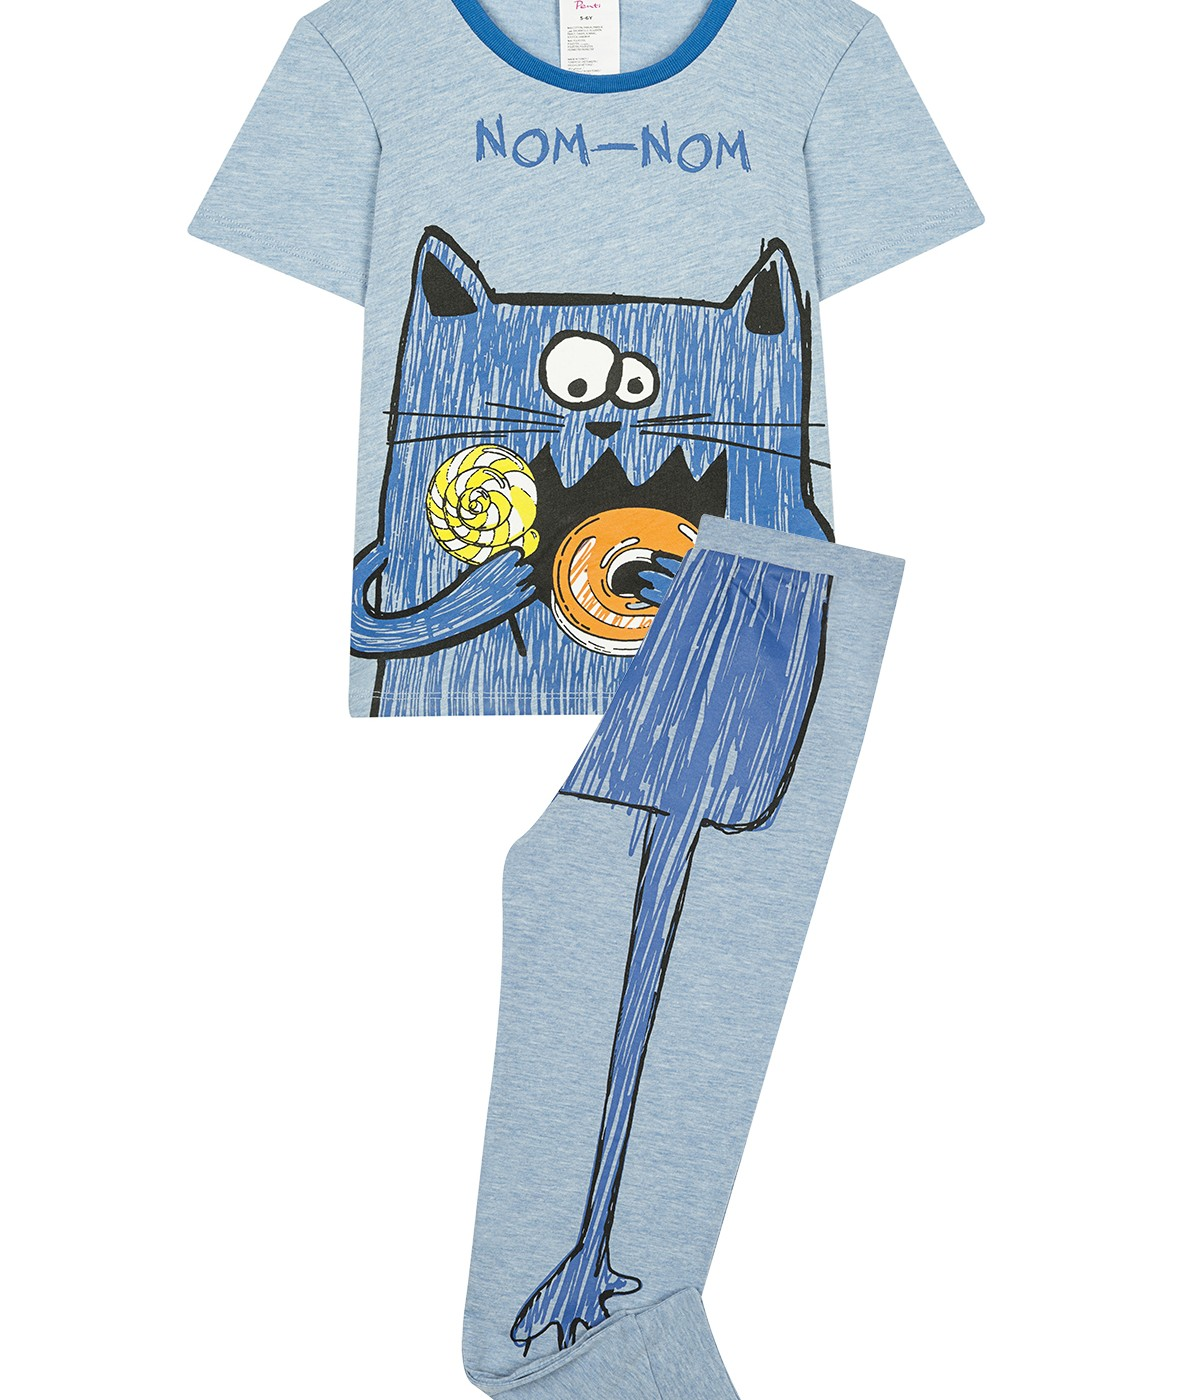 Boys Nom Nom Pyjamas 2 in 1 Set